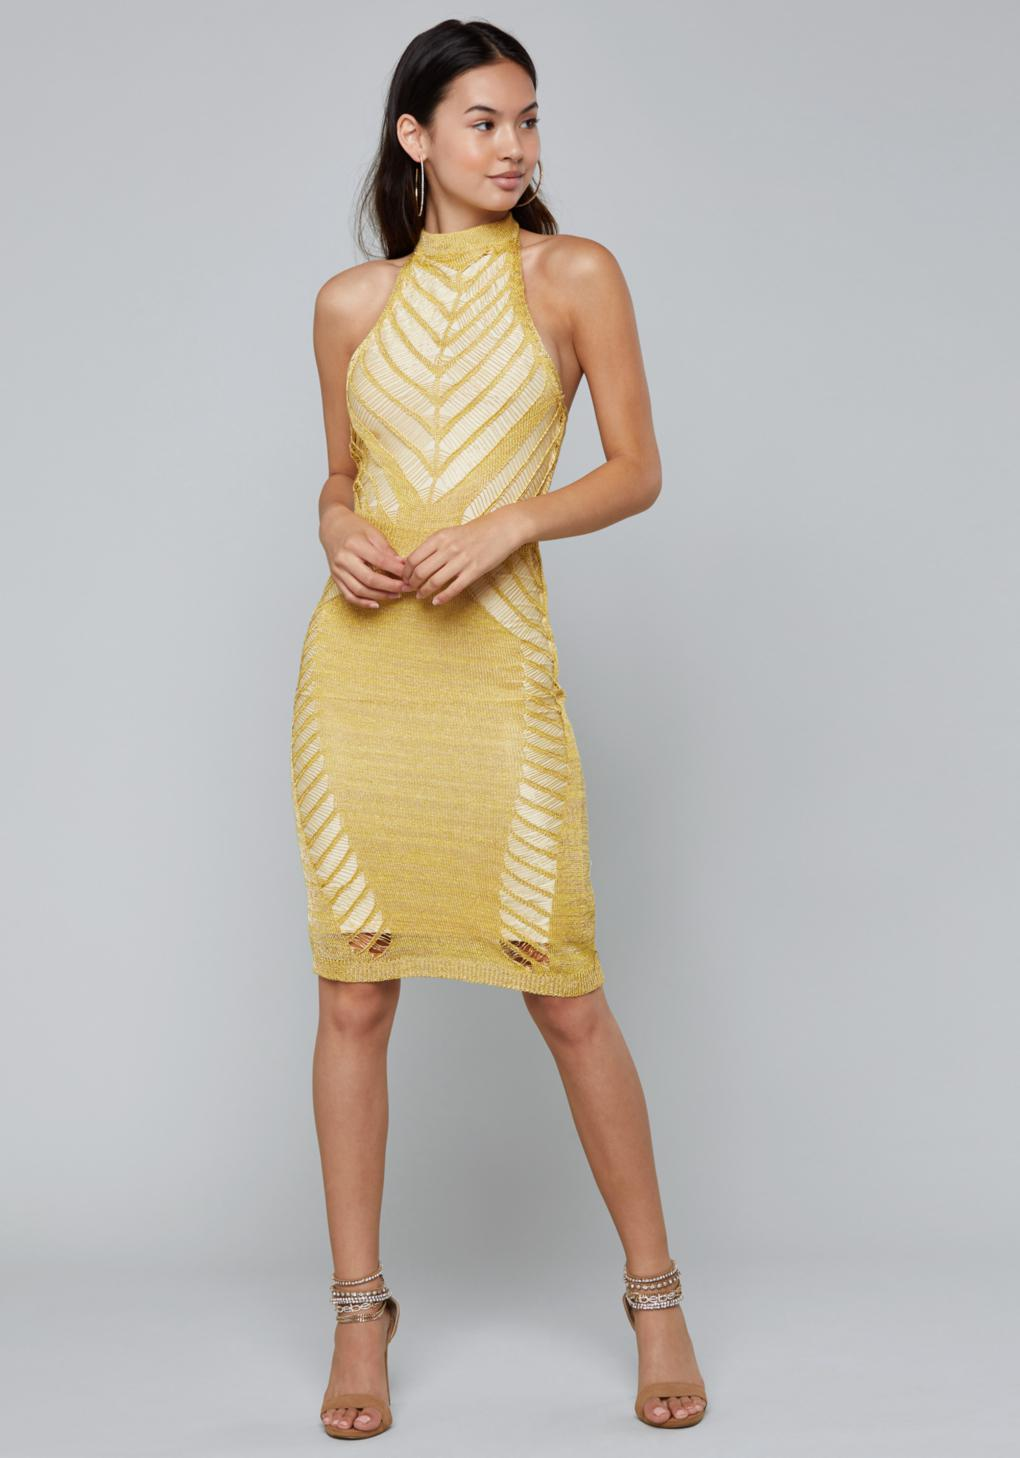 86ede6db67f Bebe Metallic Knit Halter Dress in Metallic - Lyst